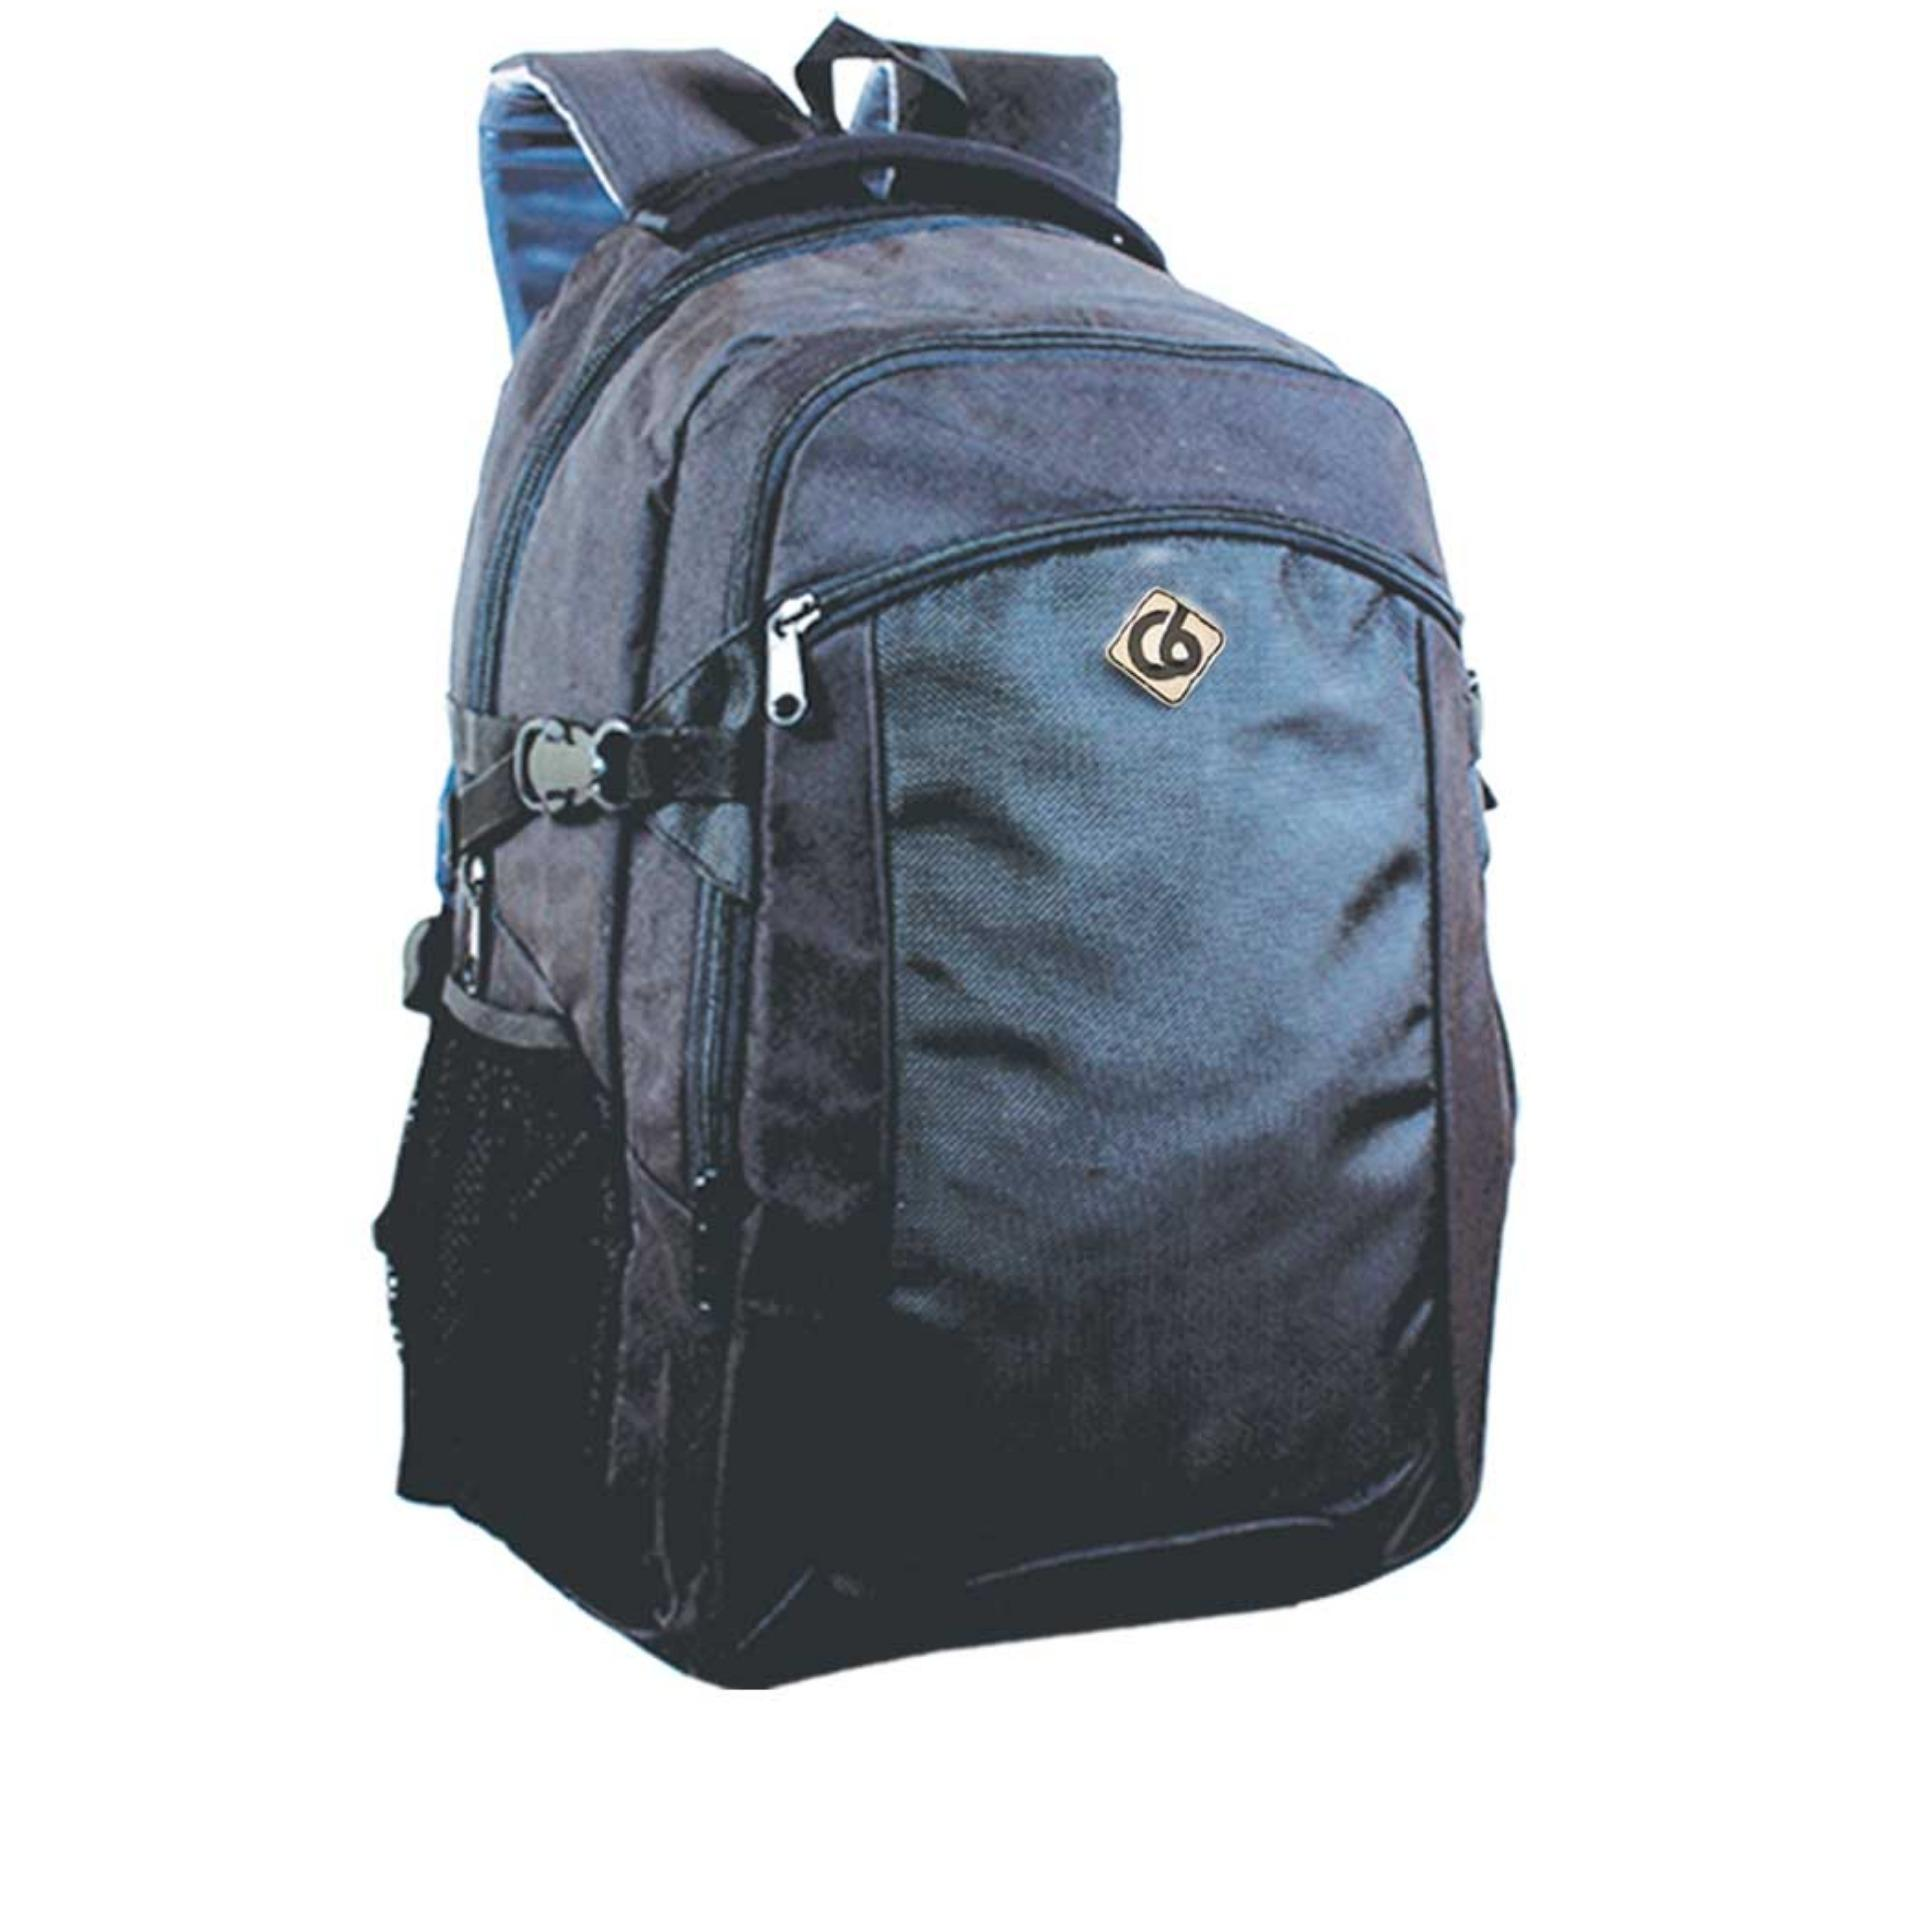 Cbr Six Tas Backpack Anak Laki Ransel Sekolah Dic 432 430 Keren Dinnir Hitam Rrc 827 Jas Hujan Pria Ergonomi